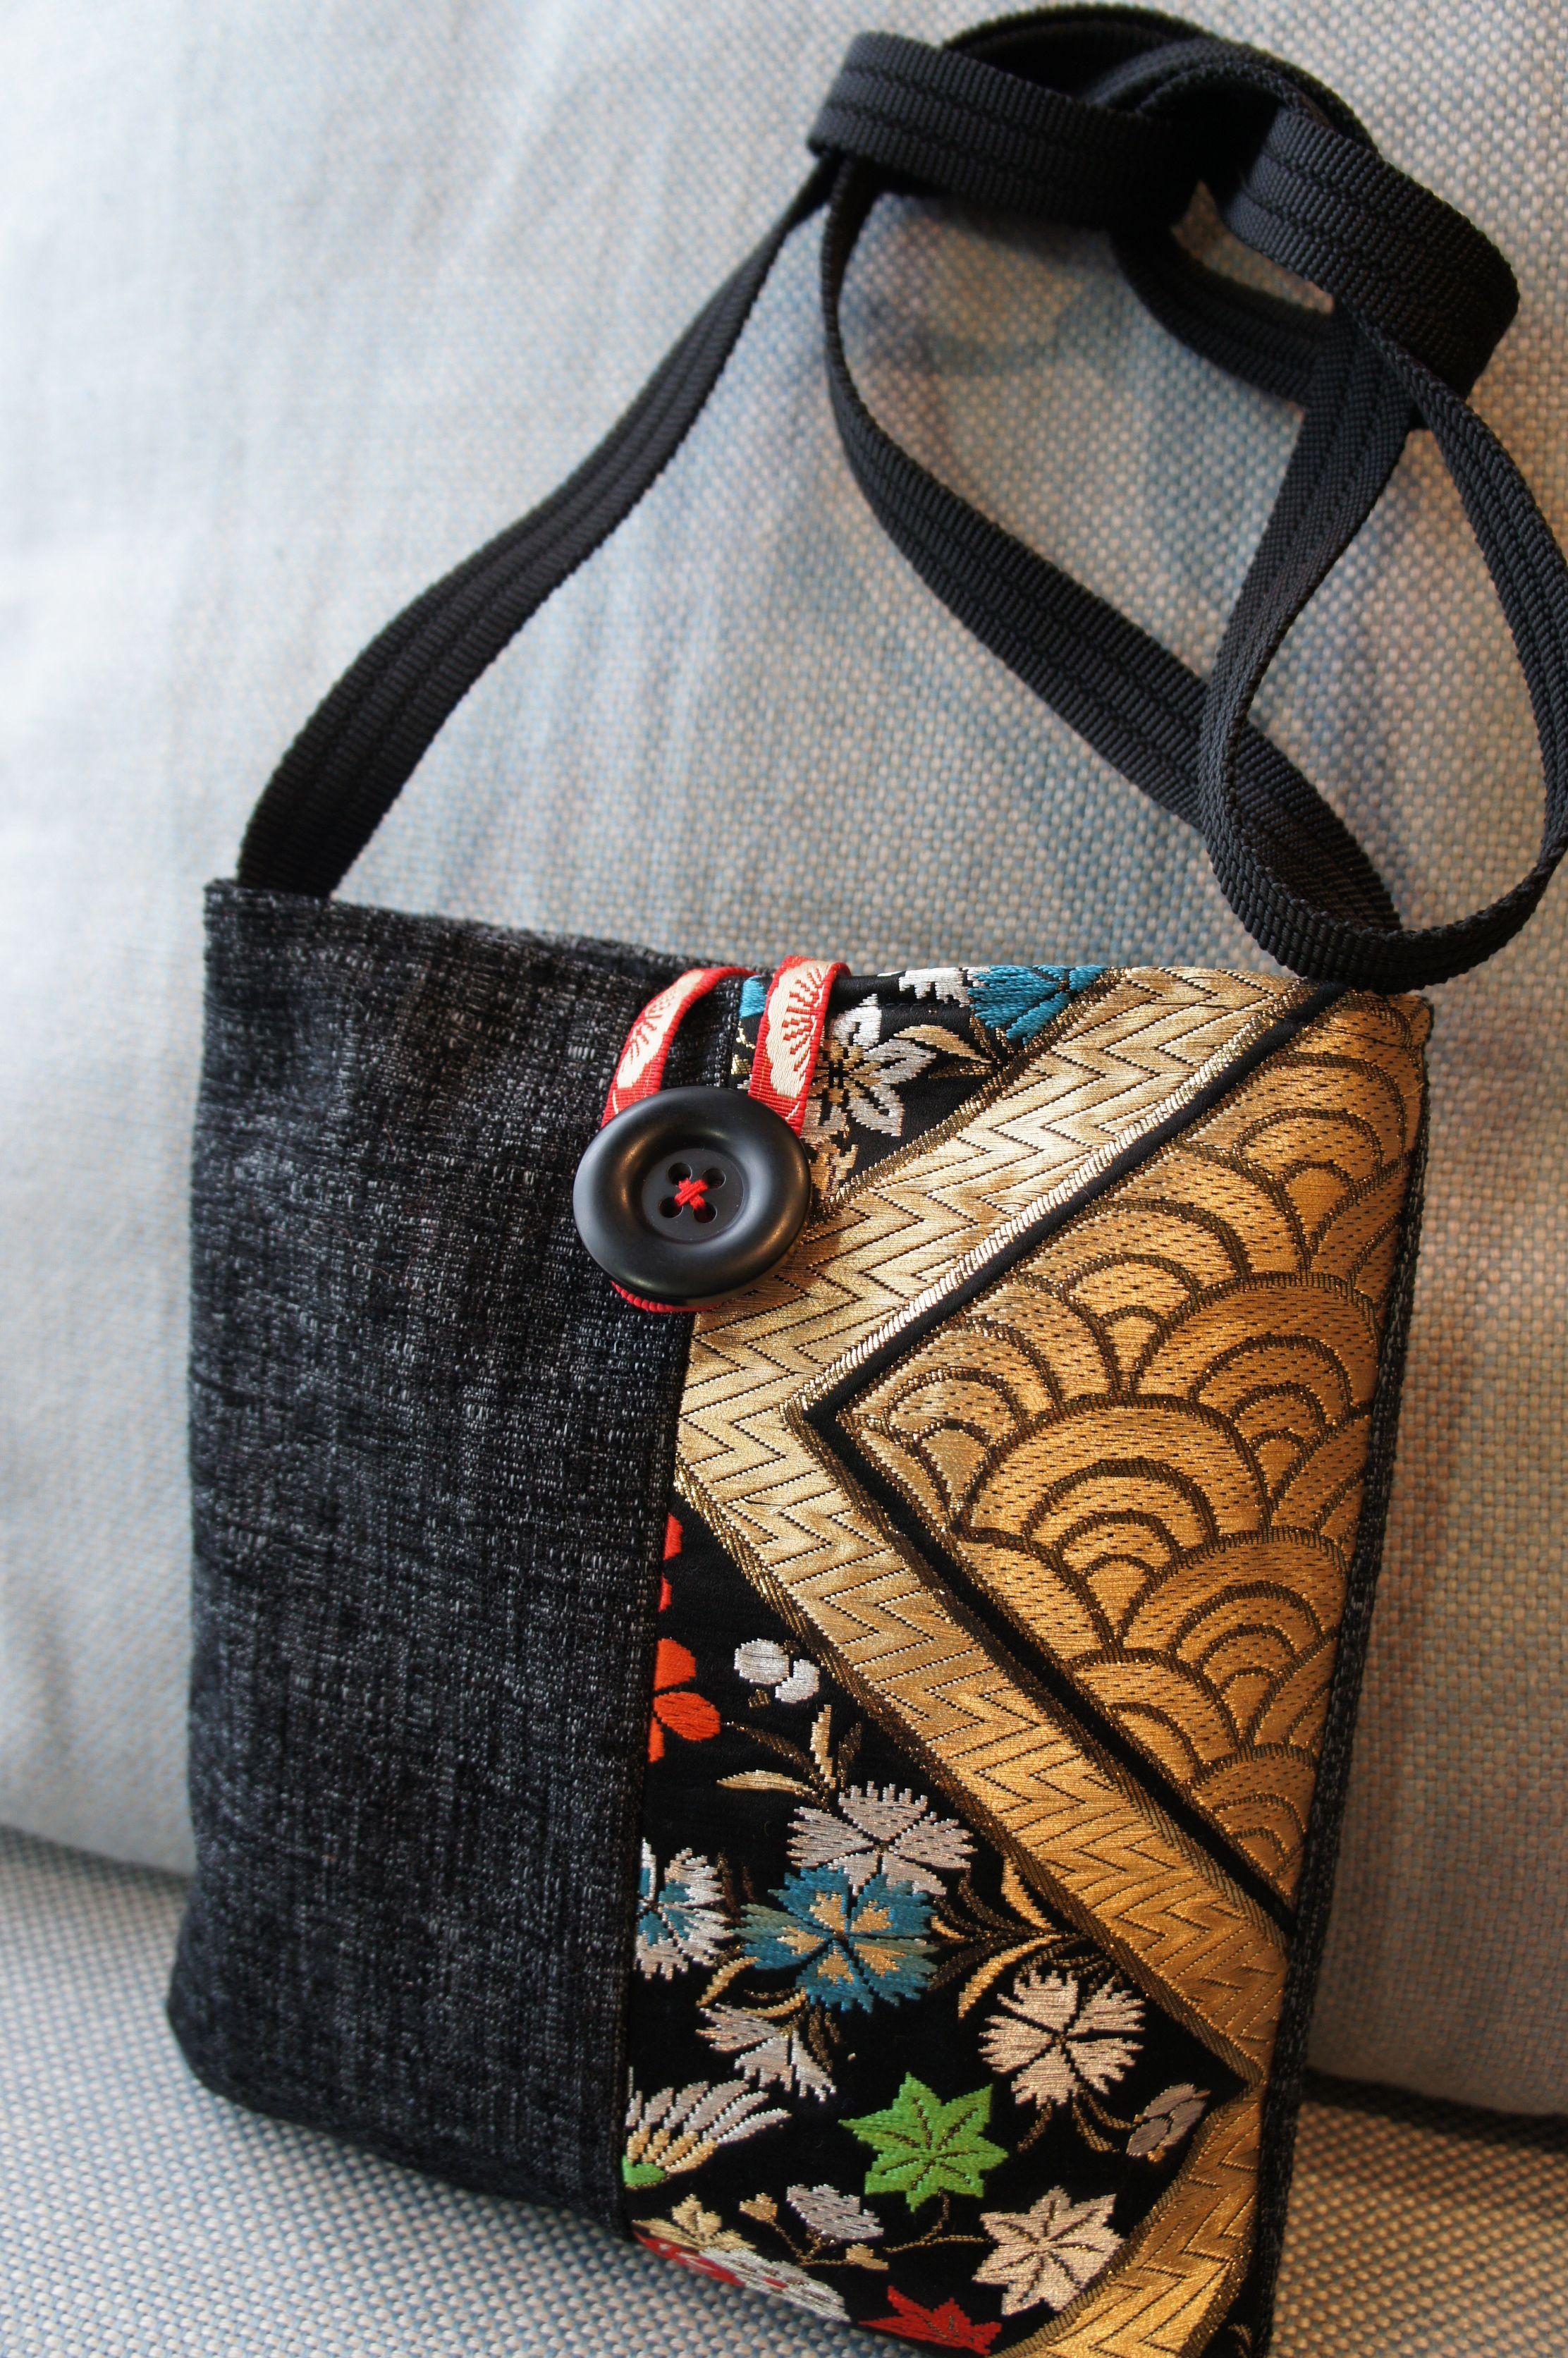 Hand Made Bag Made From Japanese Obi Kimono Fabric